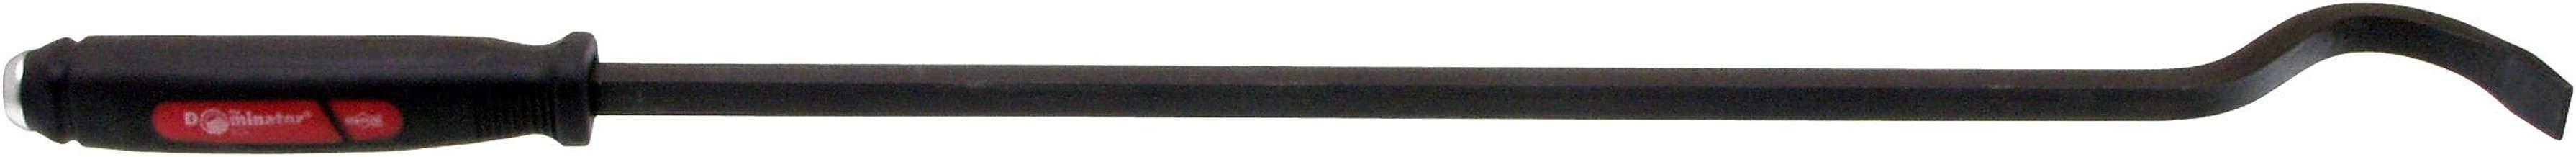 Mayhew 40170 Dominator Modified Die Bar, 30-Inch